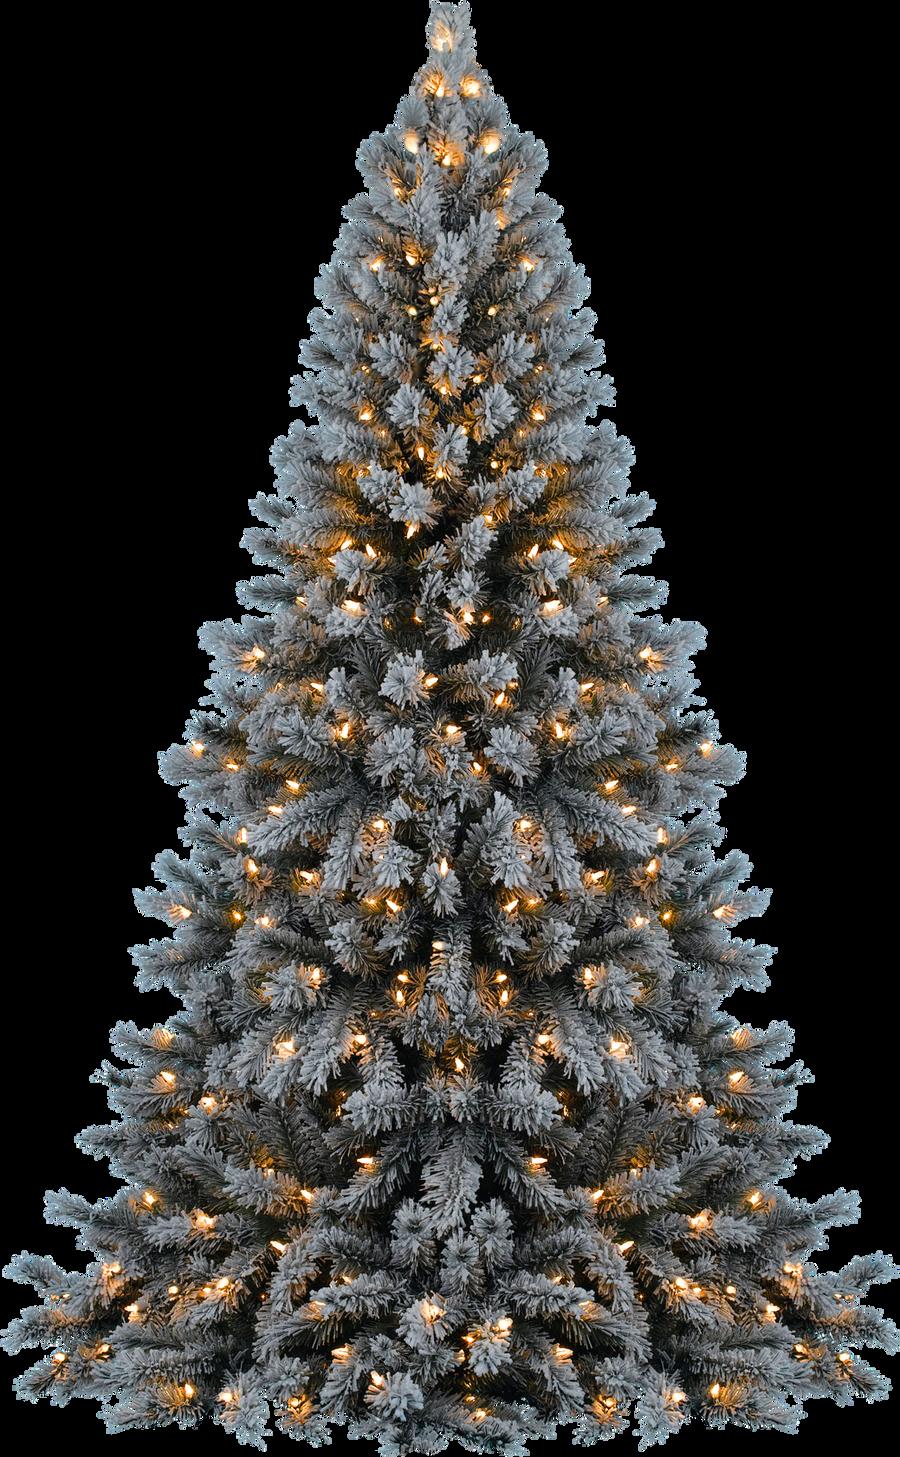 XMAS TREE PNG by dbszabo1 on DeviantArt